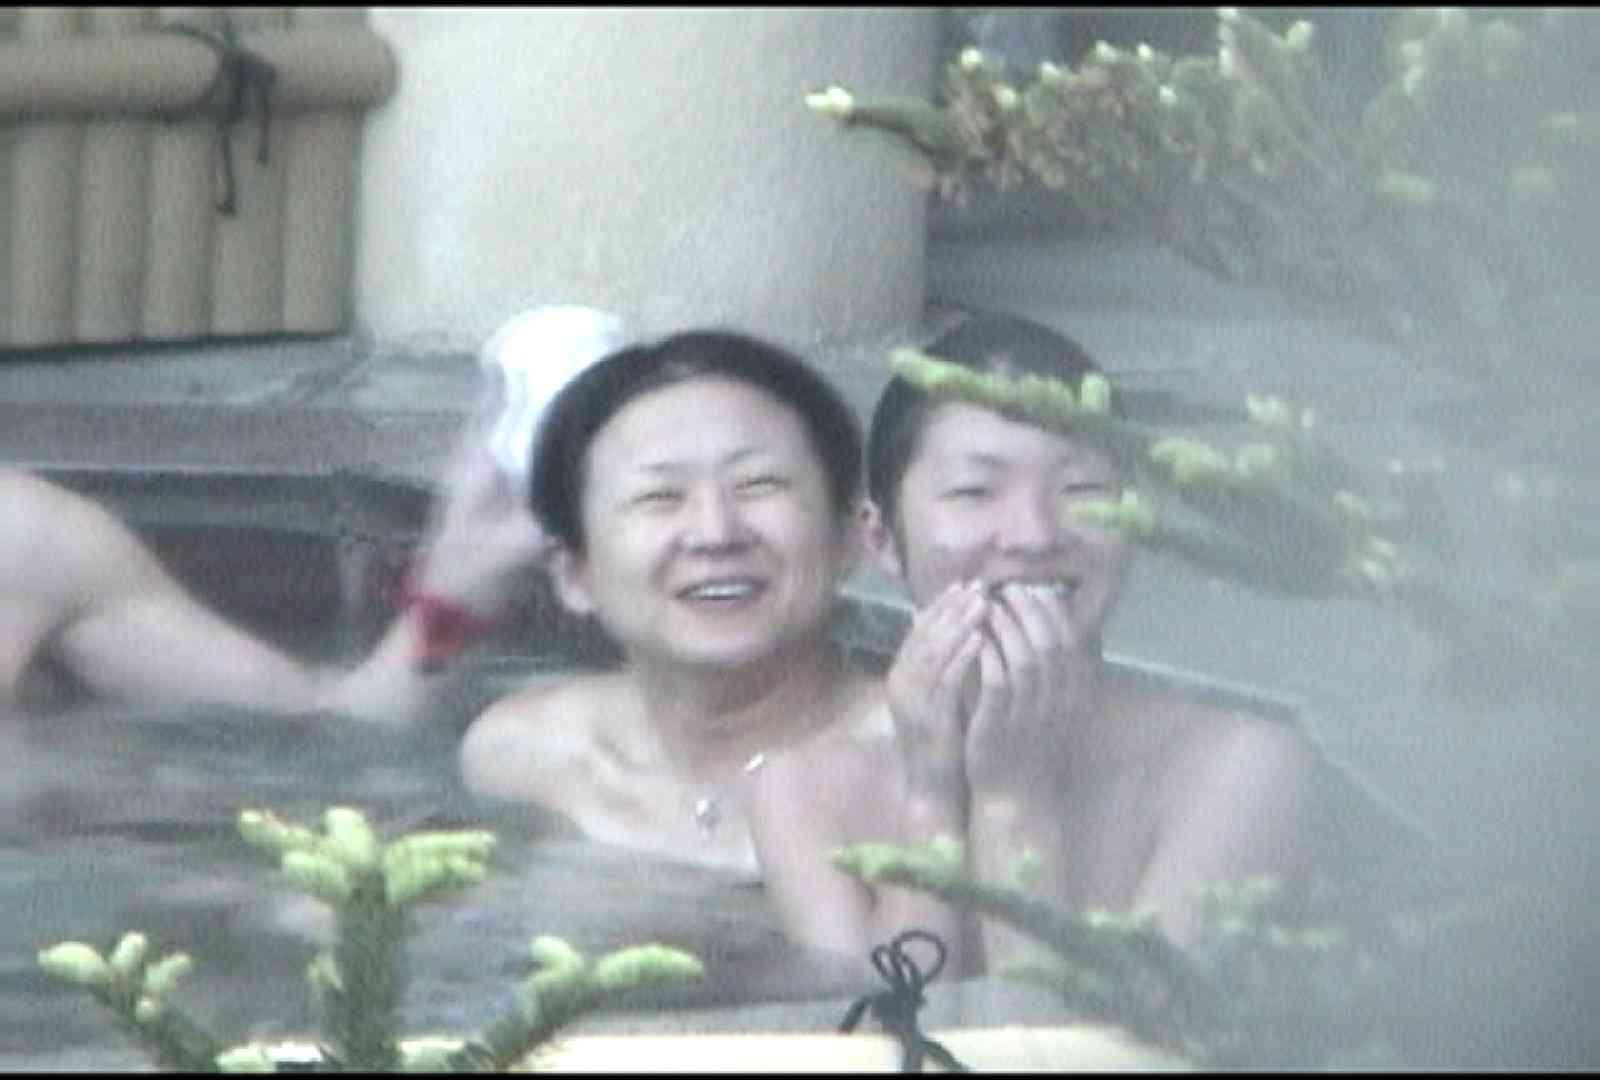 Aquaな露天風呂Vol.15 盗撮映像  42Pix 27